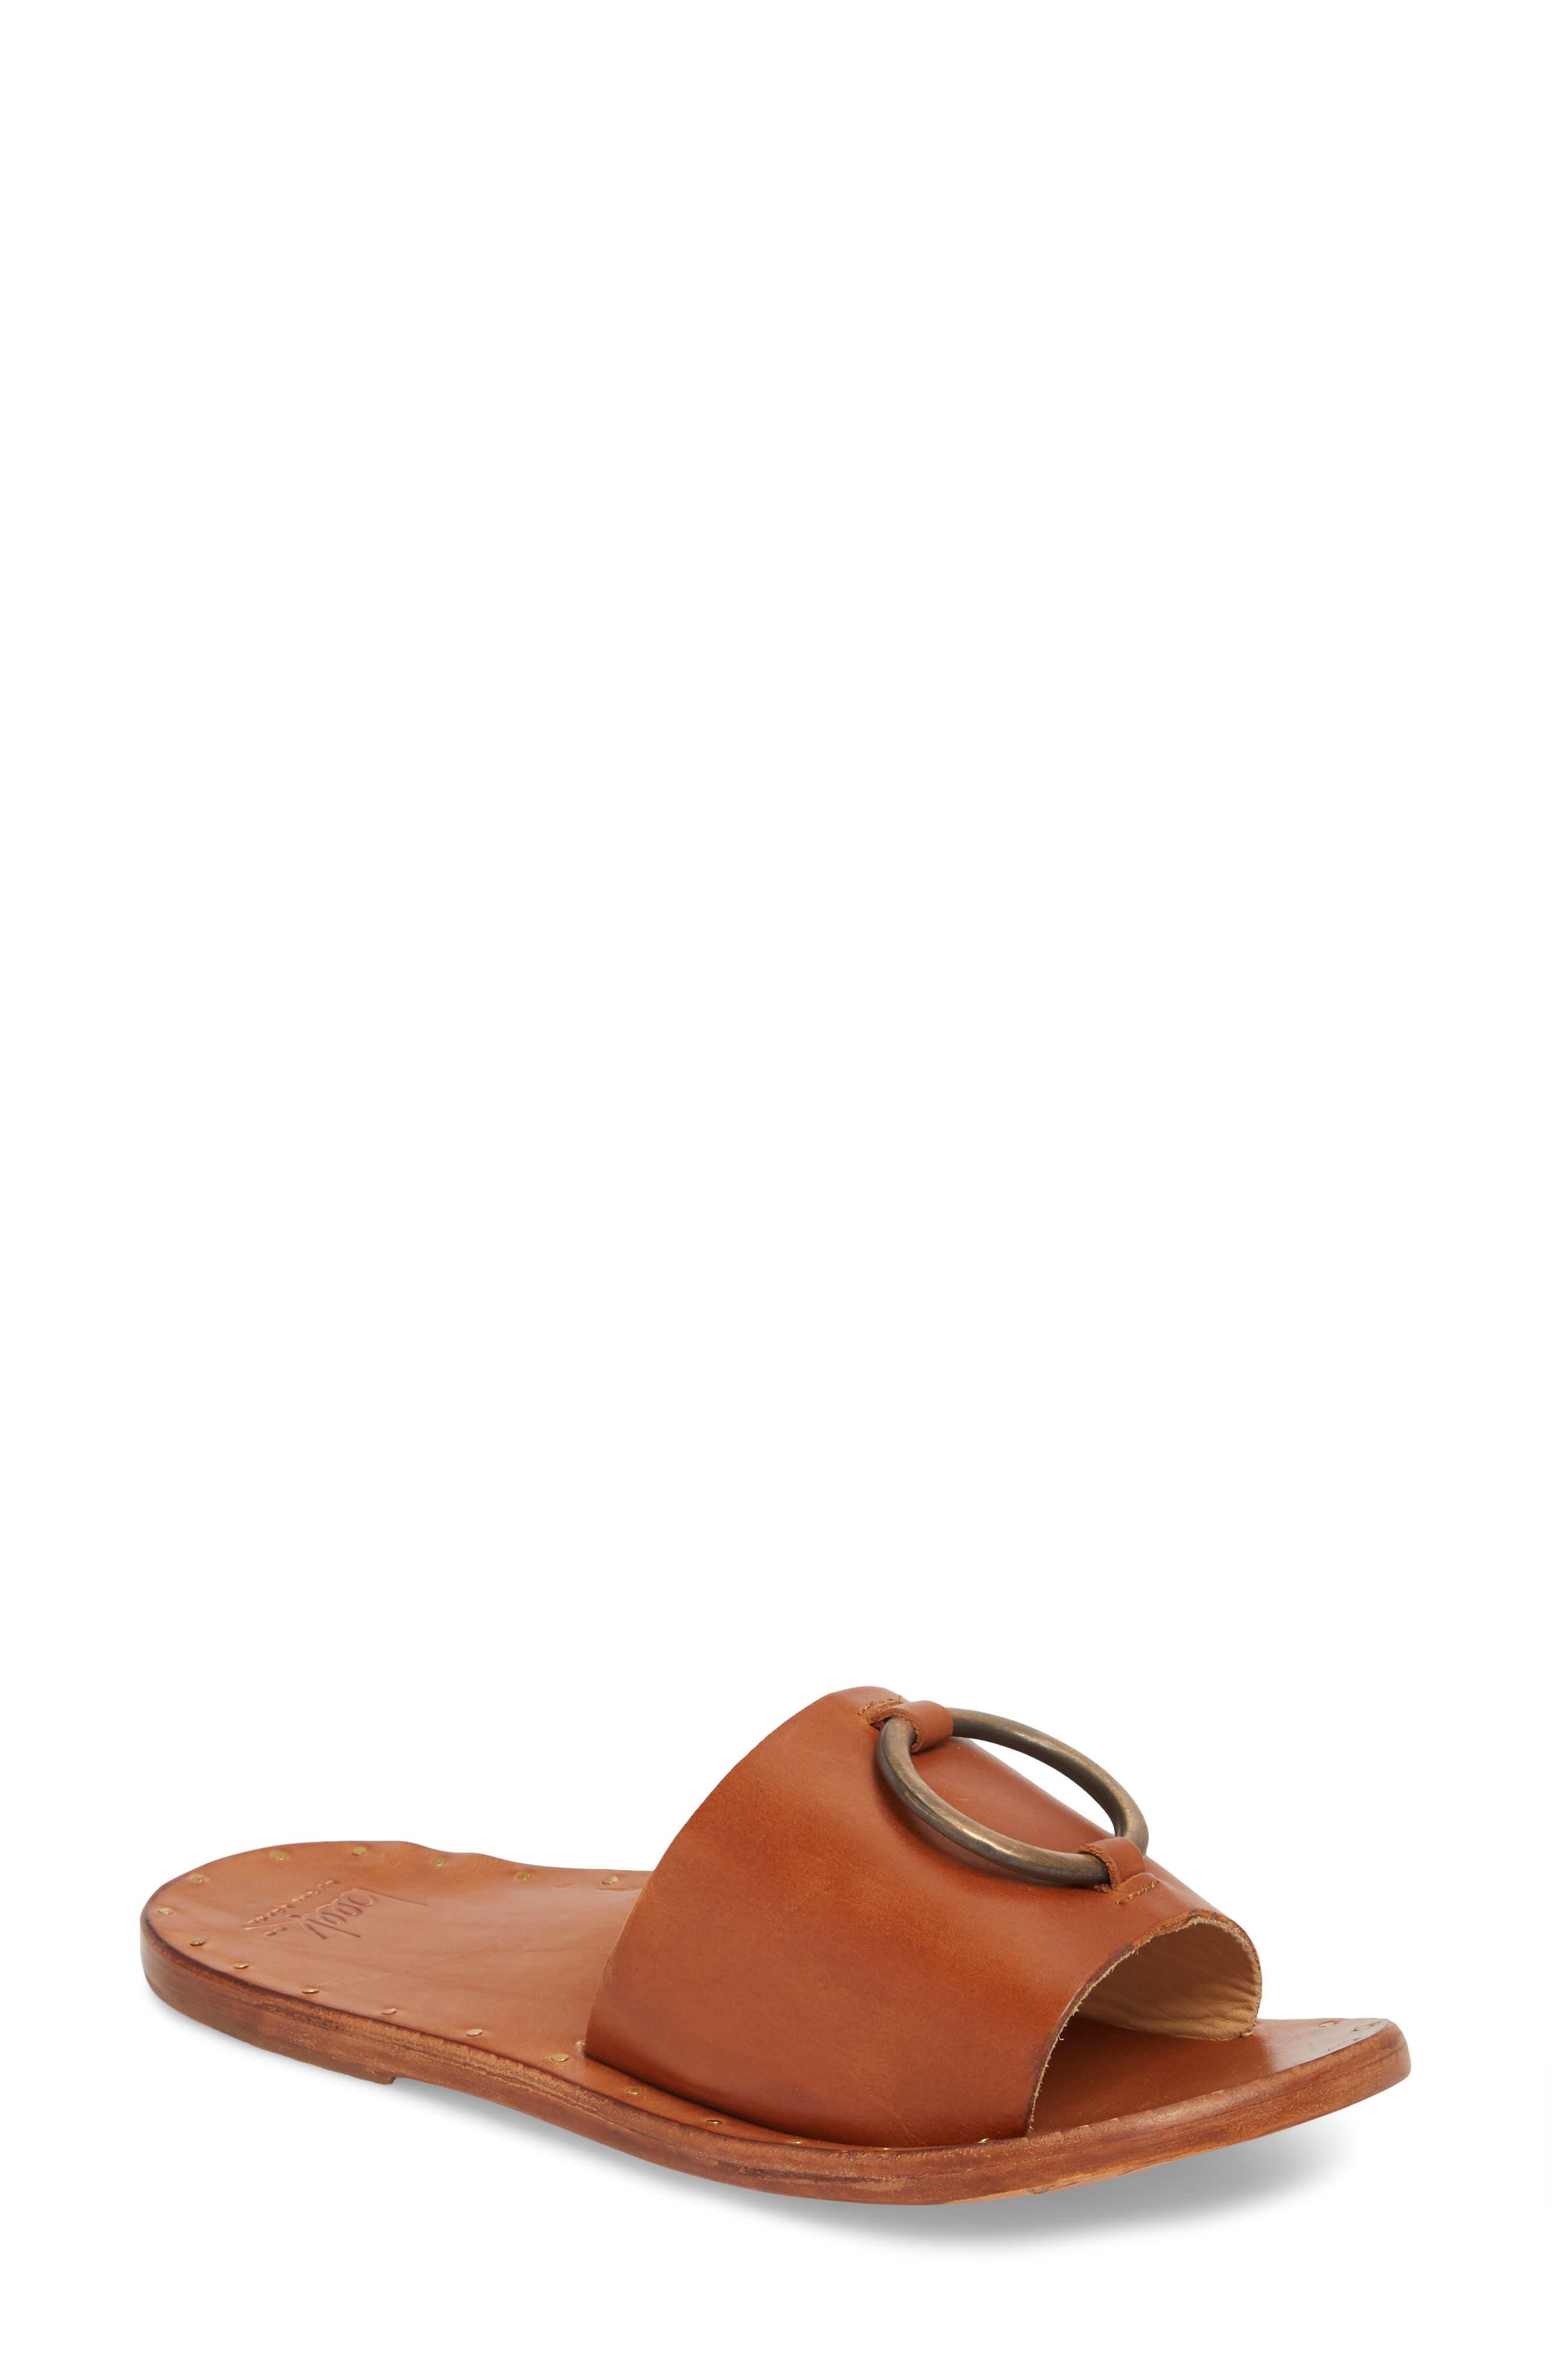 Cockatoo Slide Sandal,                             Main thumbnail 1, color,                             Tan/ Tan